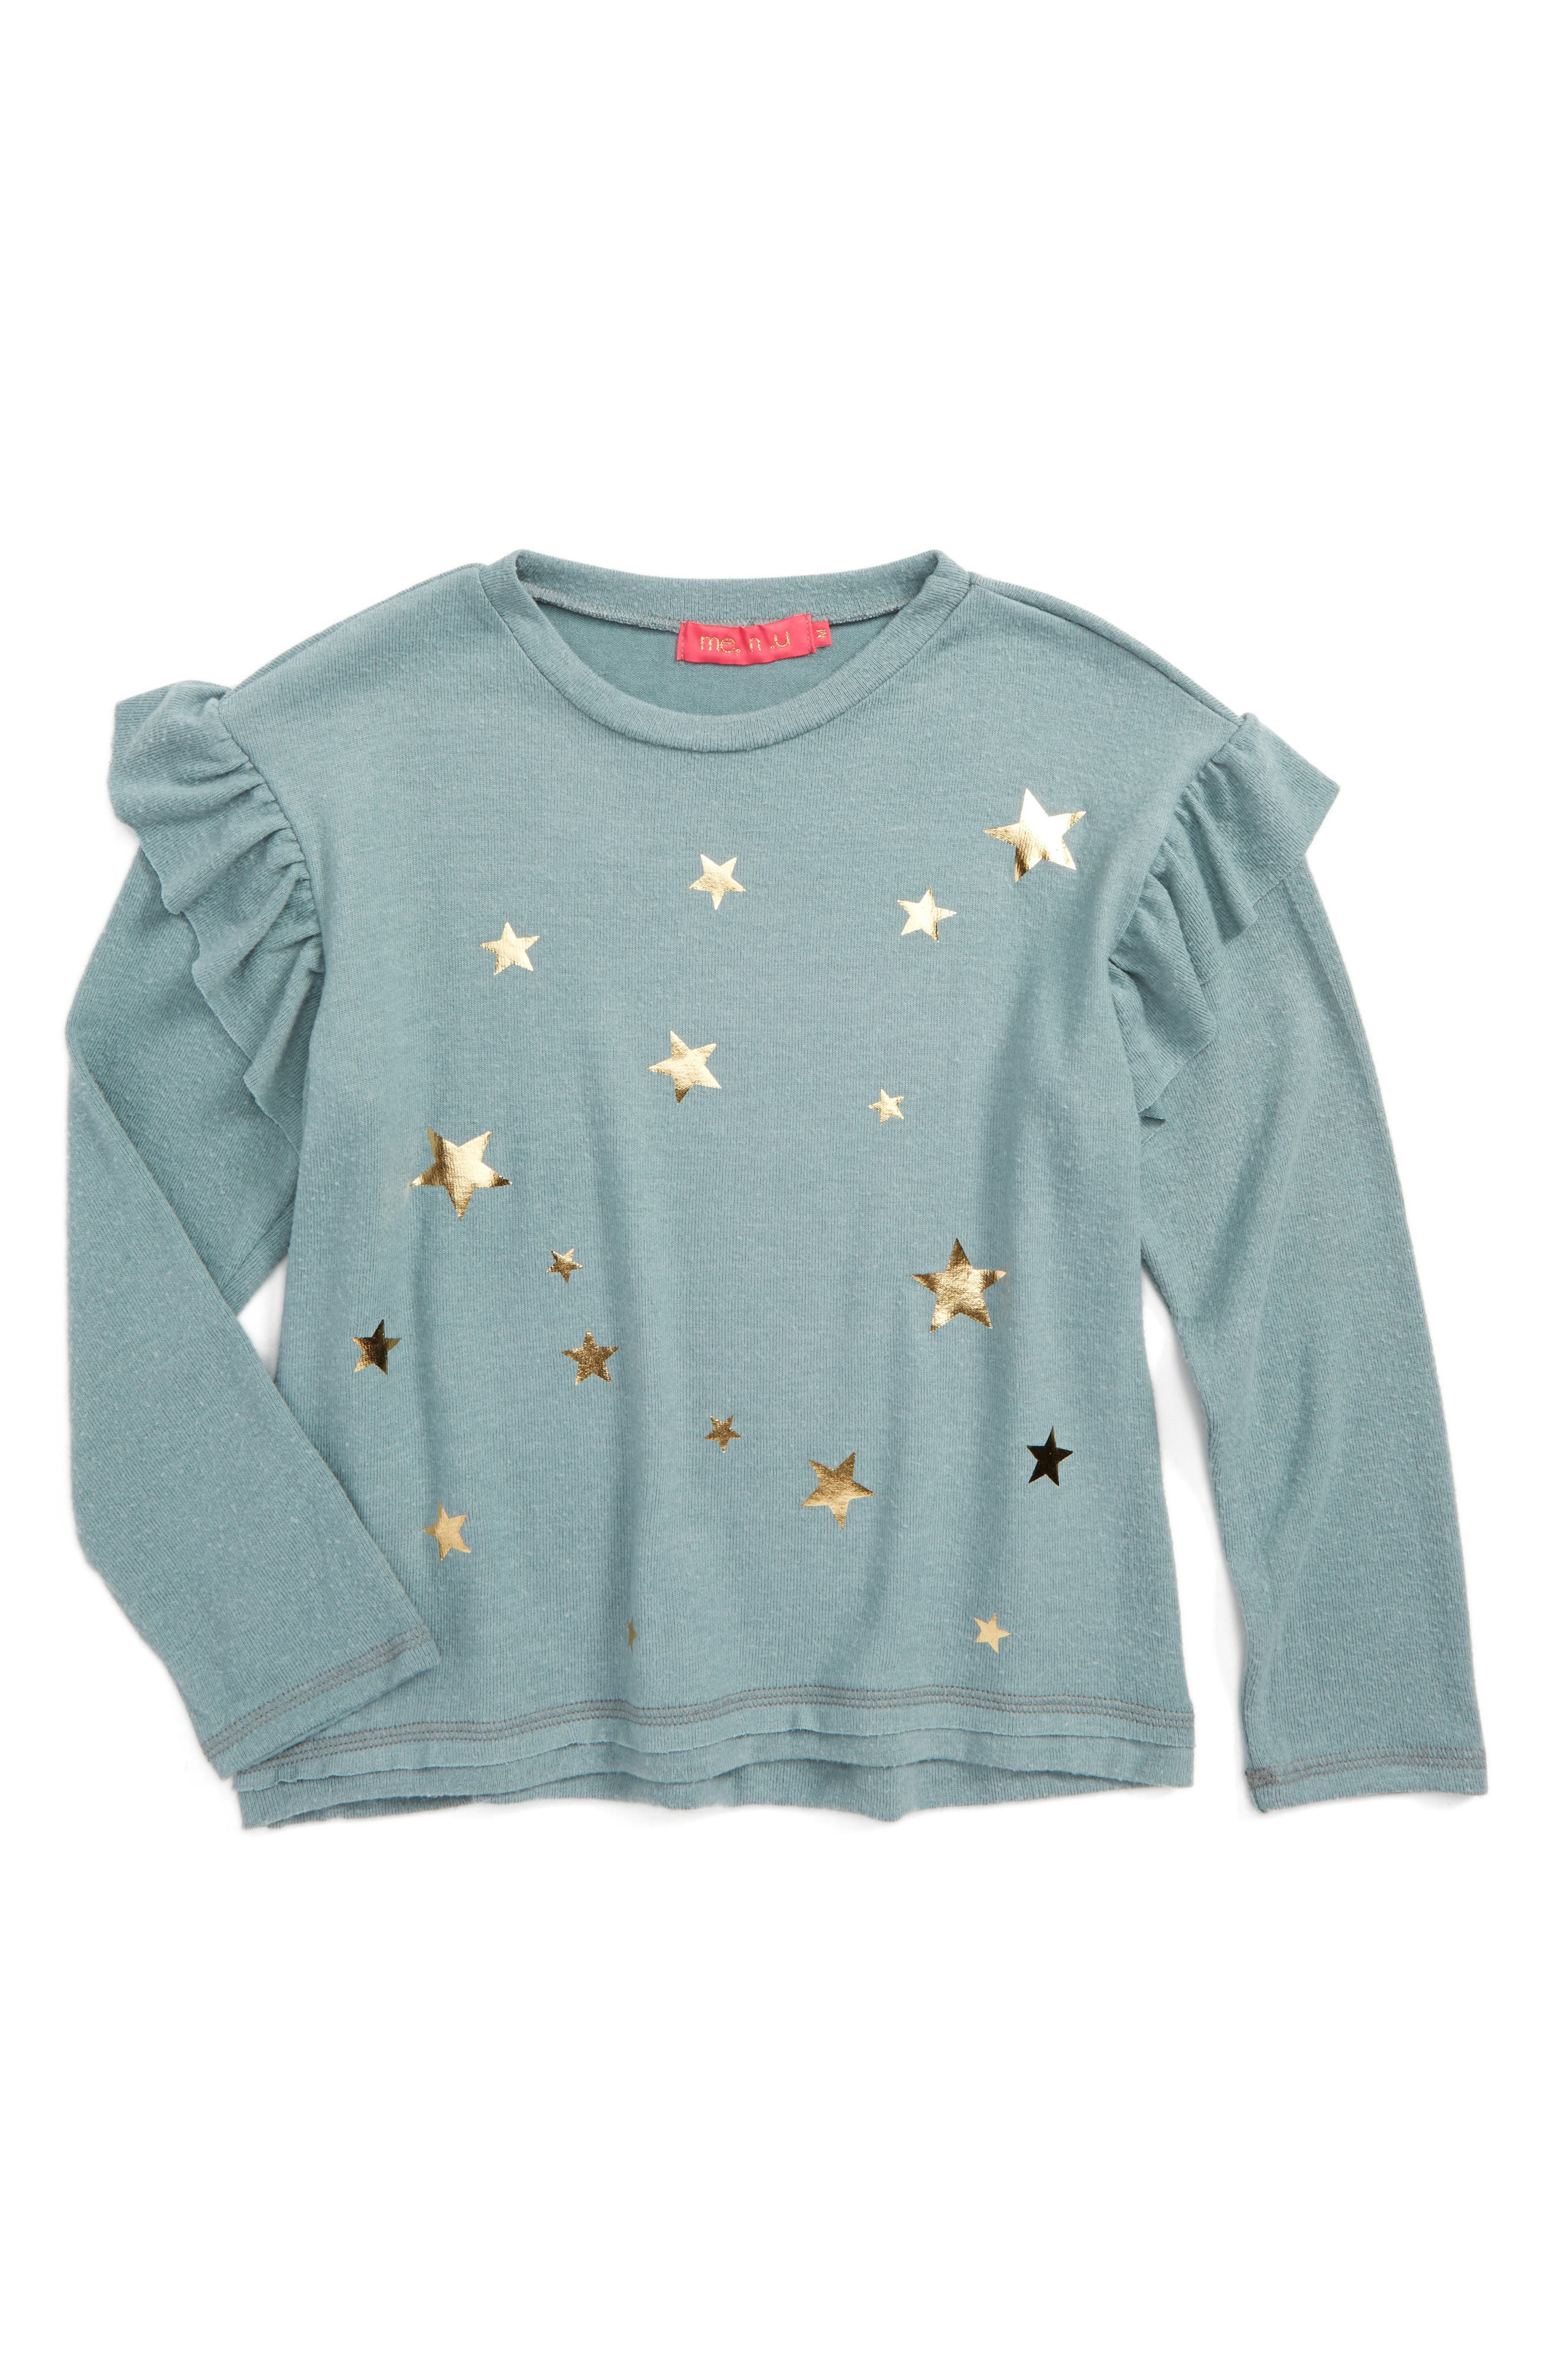 Main Image - me.n.u Star Print Ruffle Sweatshirt (Big Girls)